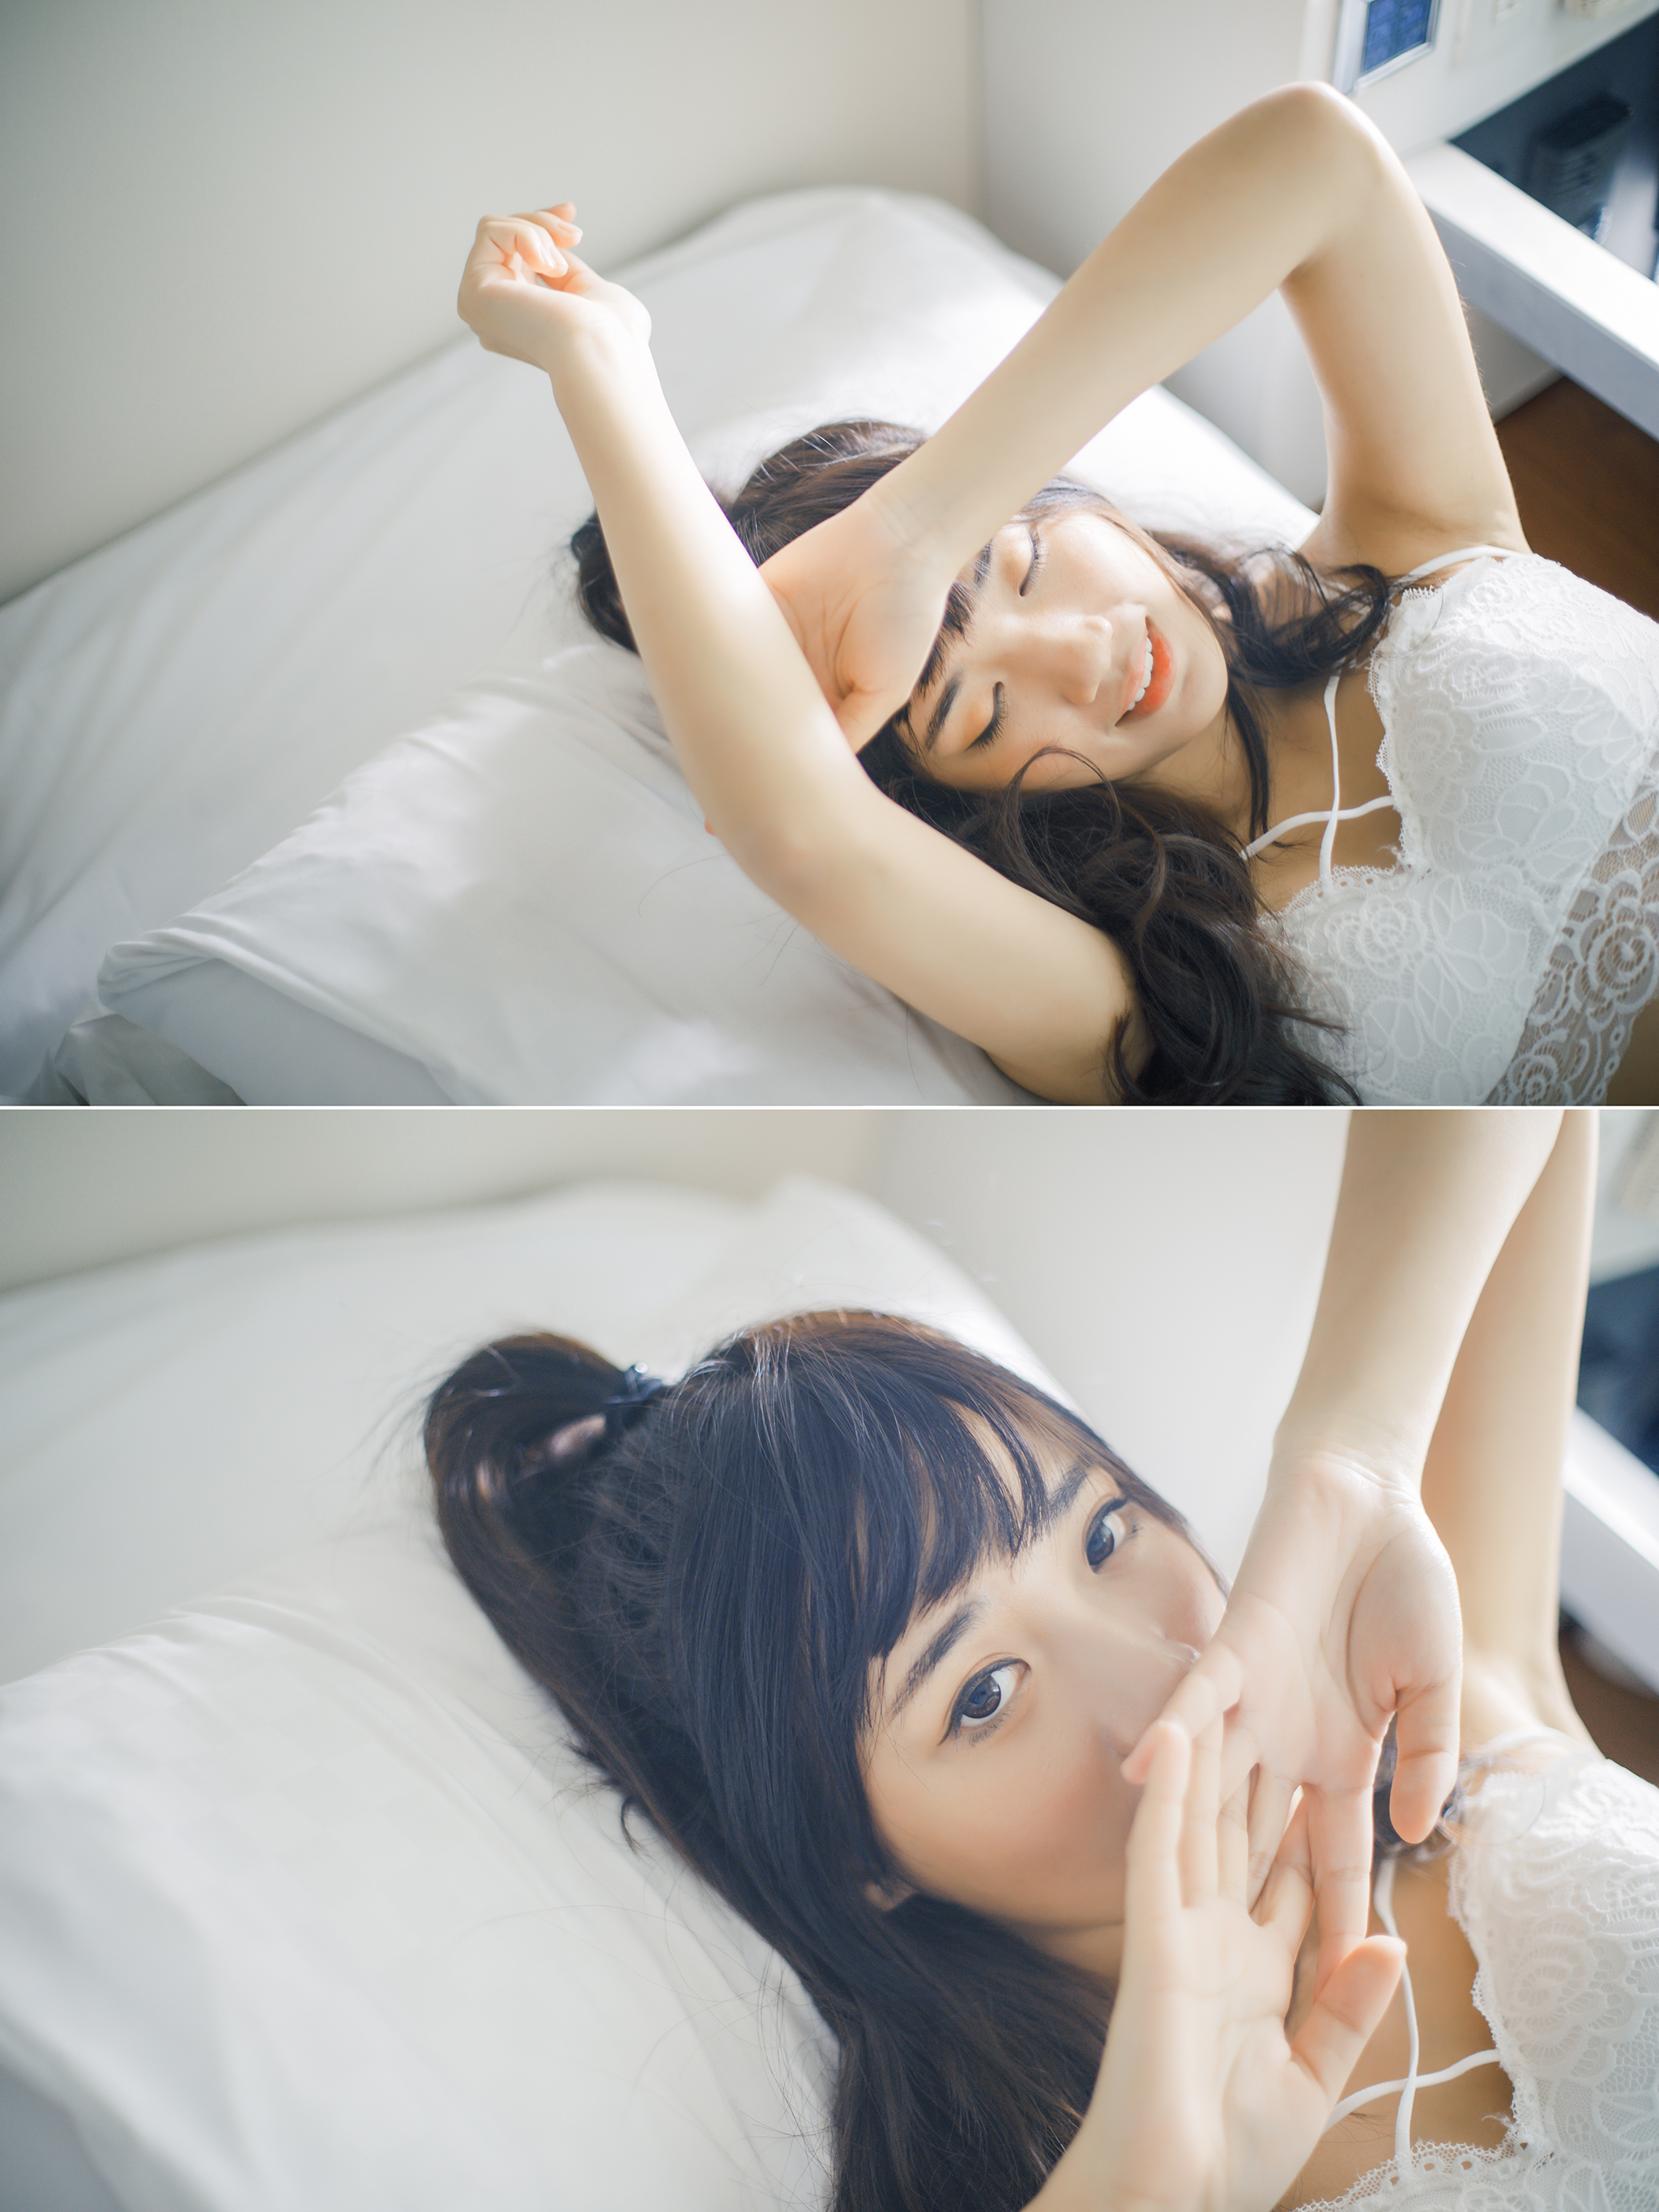 45970273924 0b4f8e8987 o - 【人像寫真】+Yonekura+